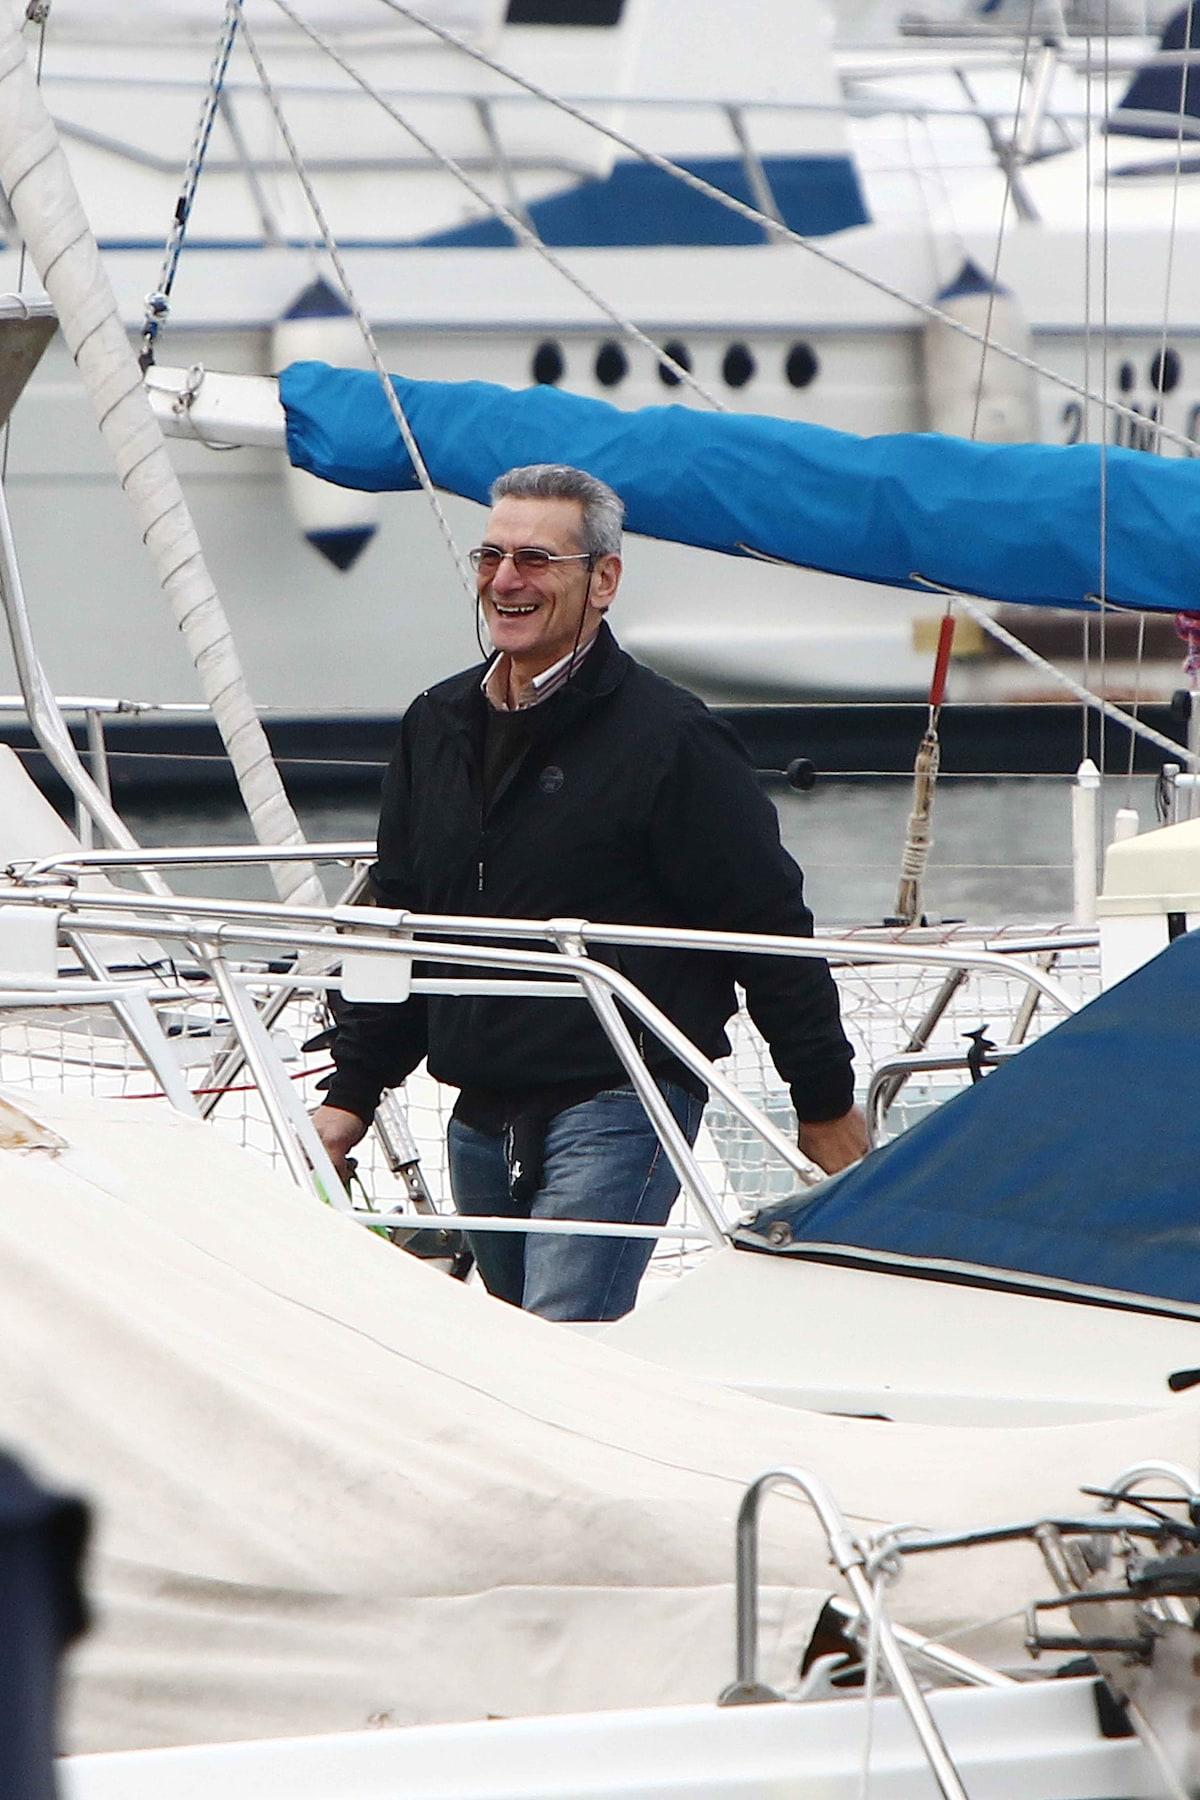 Danilo from Ancona